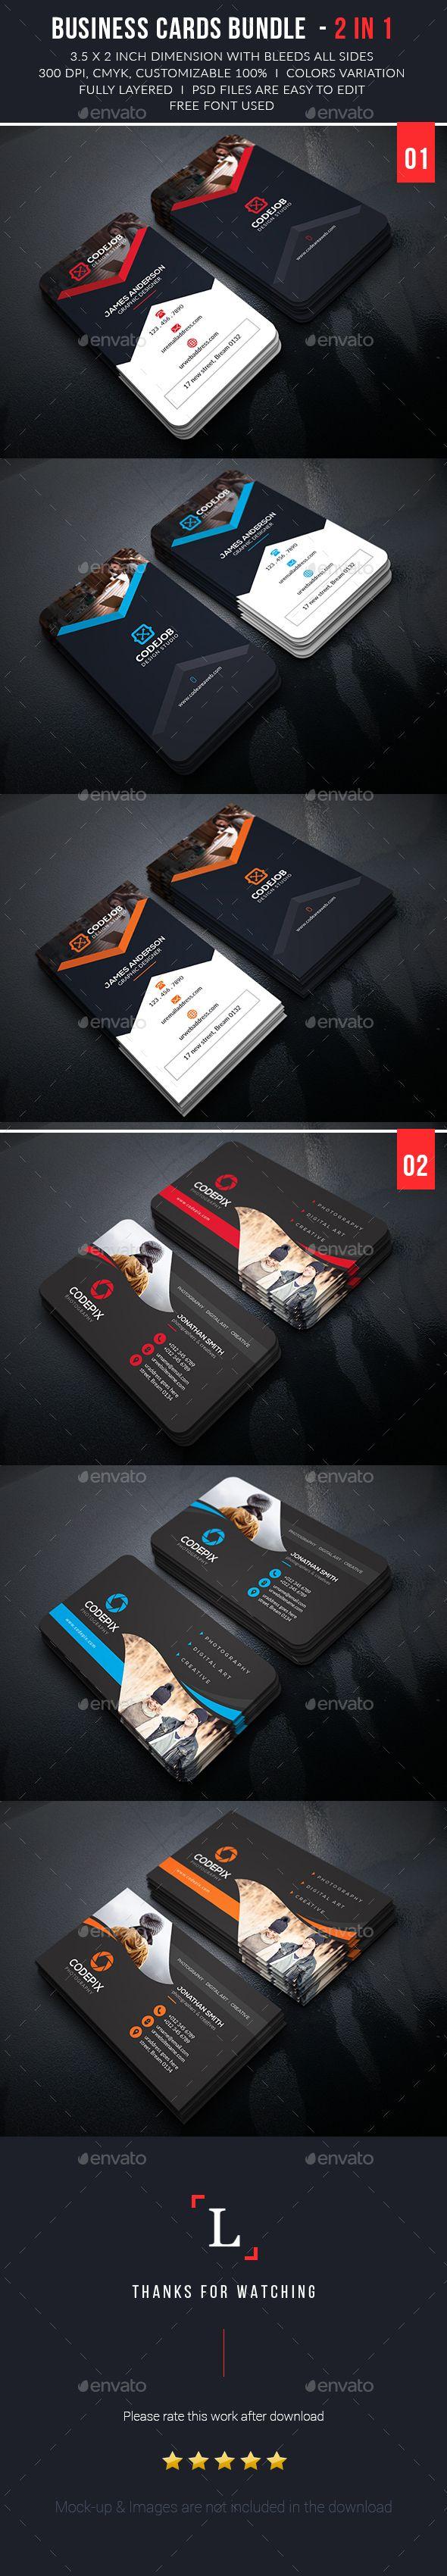 Business Card Template PSD Bundle #visitcard #design Download: http://graphicriver.net/item/business-card-bundle/13434625?ref=ksioks